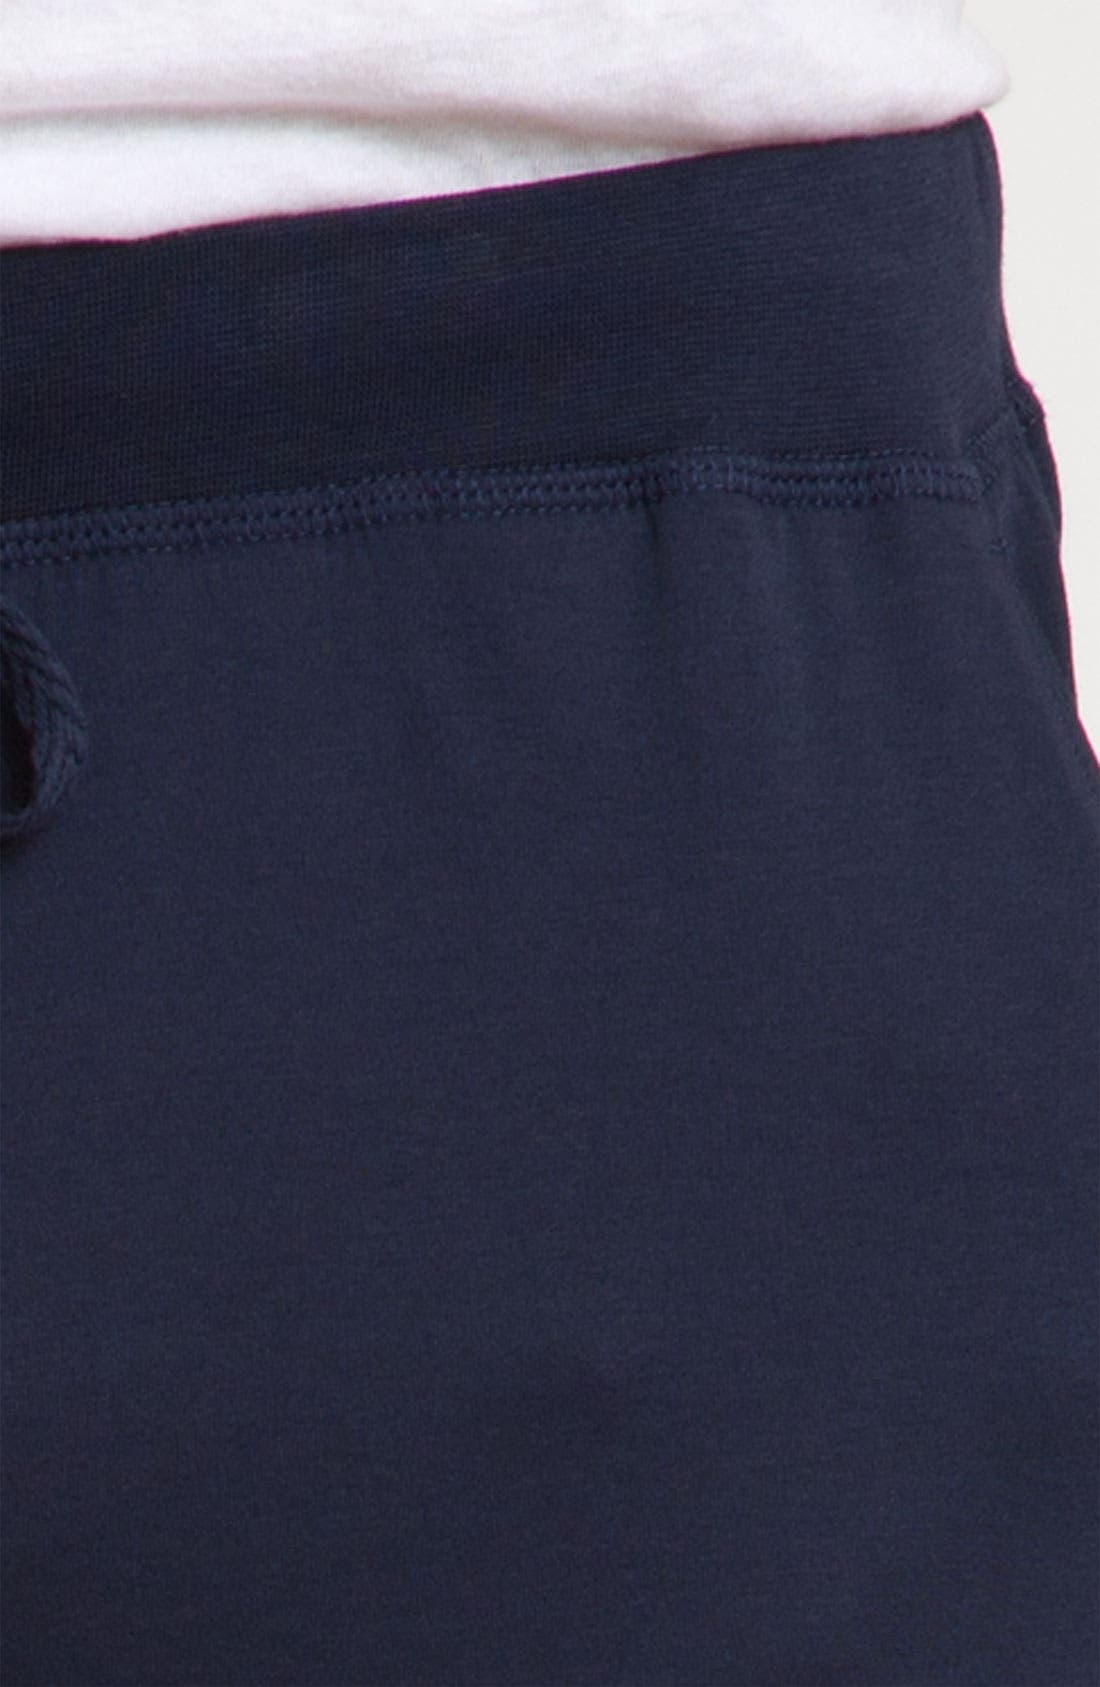 Alternate Image 3  - Daniel Buchler Peruvian Pima Lightweight Cotton Lounge Pants